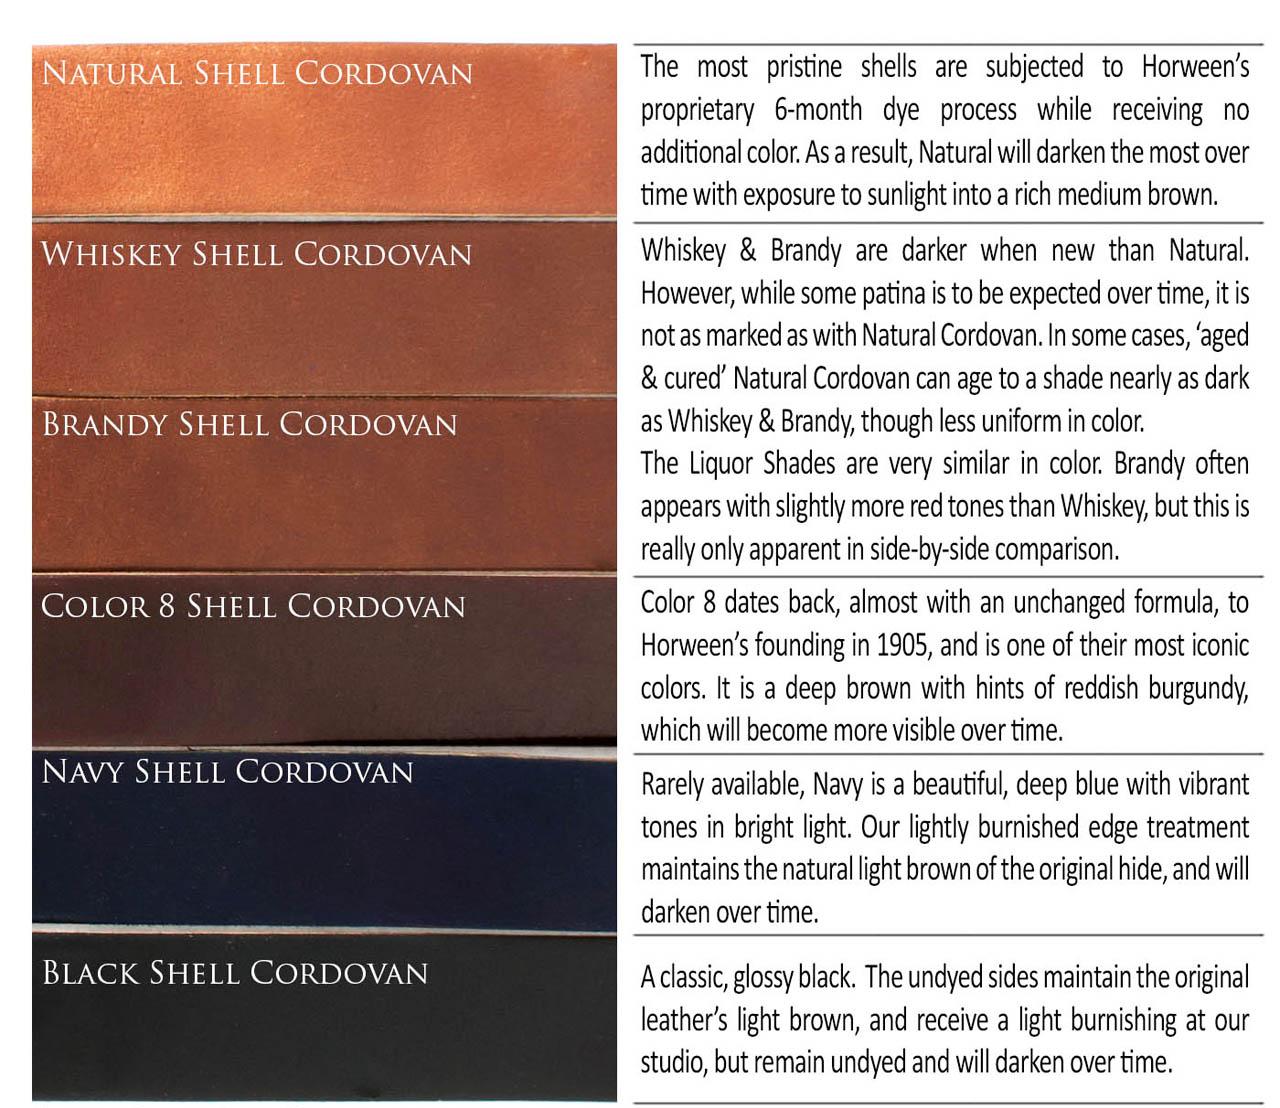 Horweens shell cordovan colours keikari horweens shell horweensshellcordovancoloursatkeikaridotcom nvjuhfo Gallery